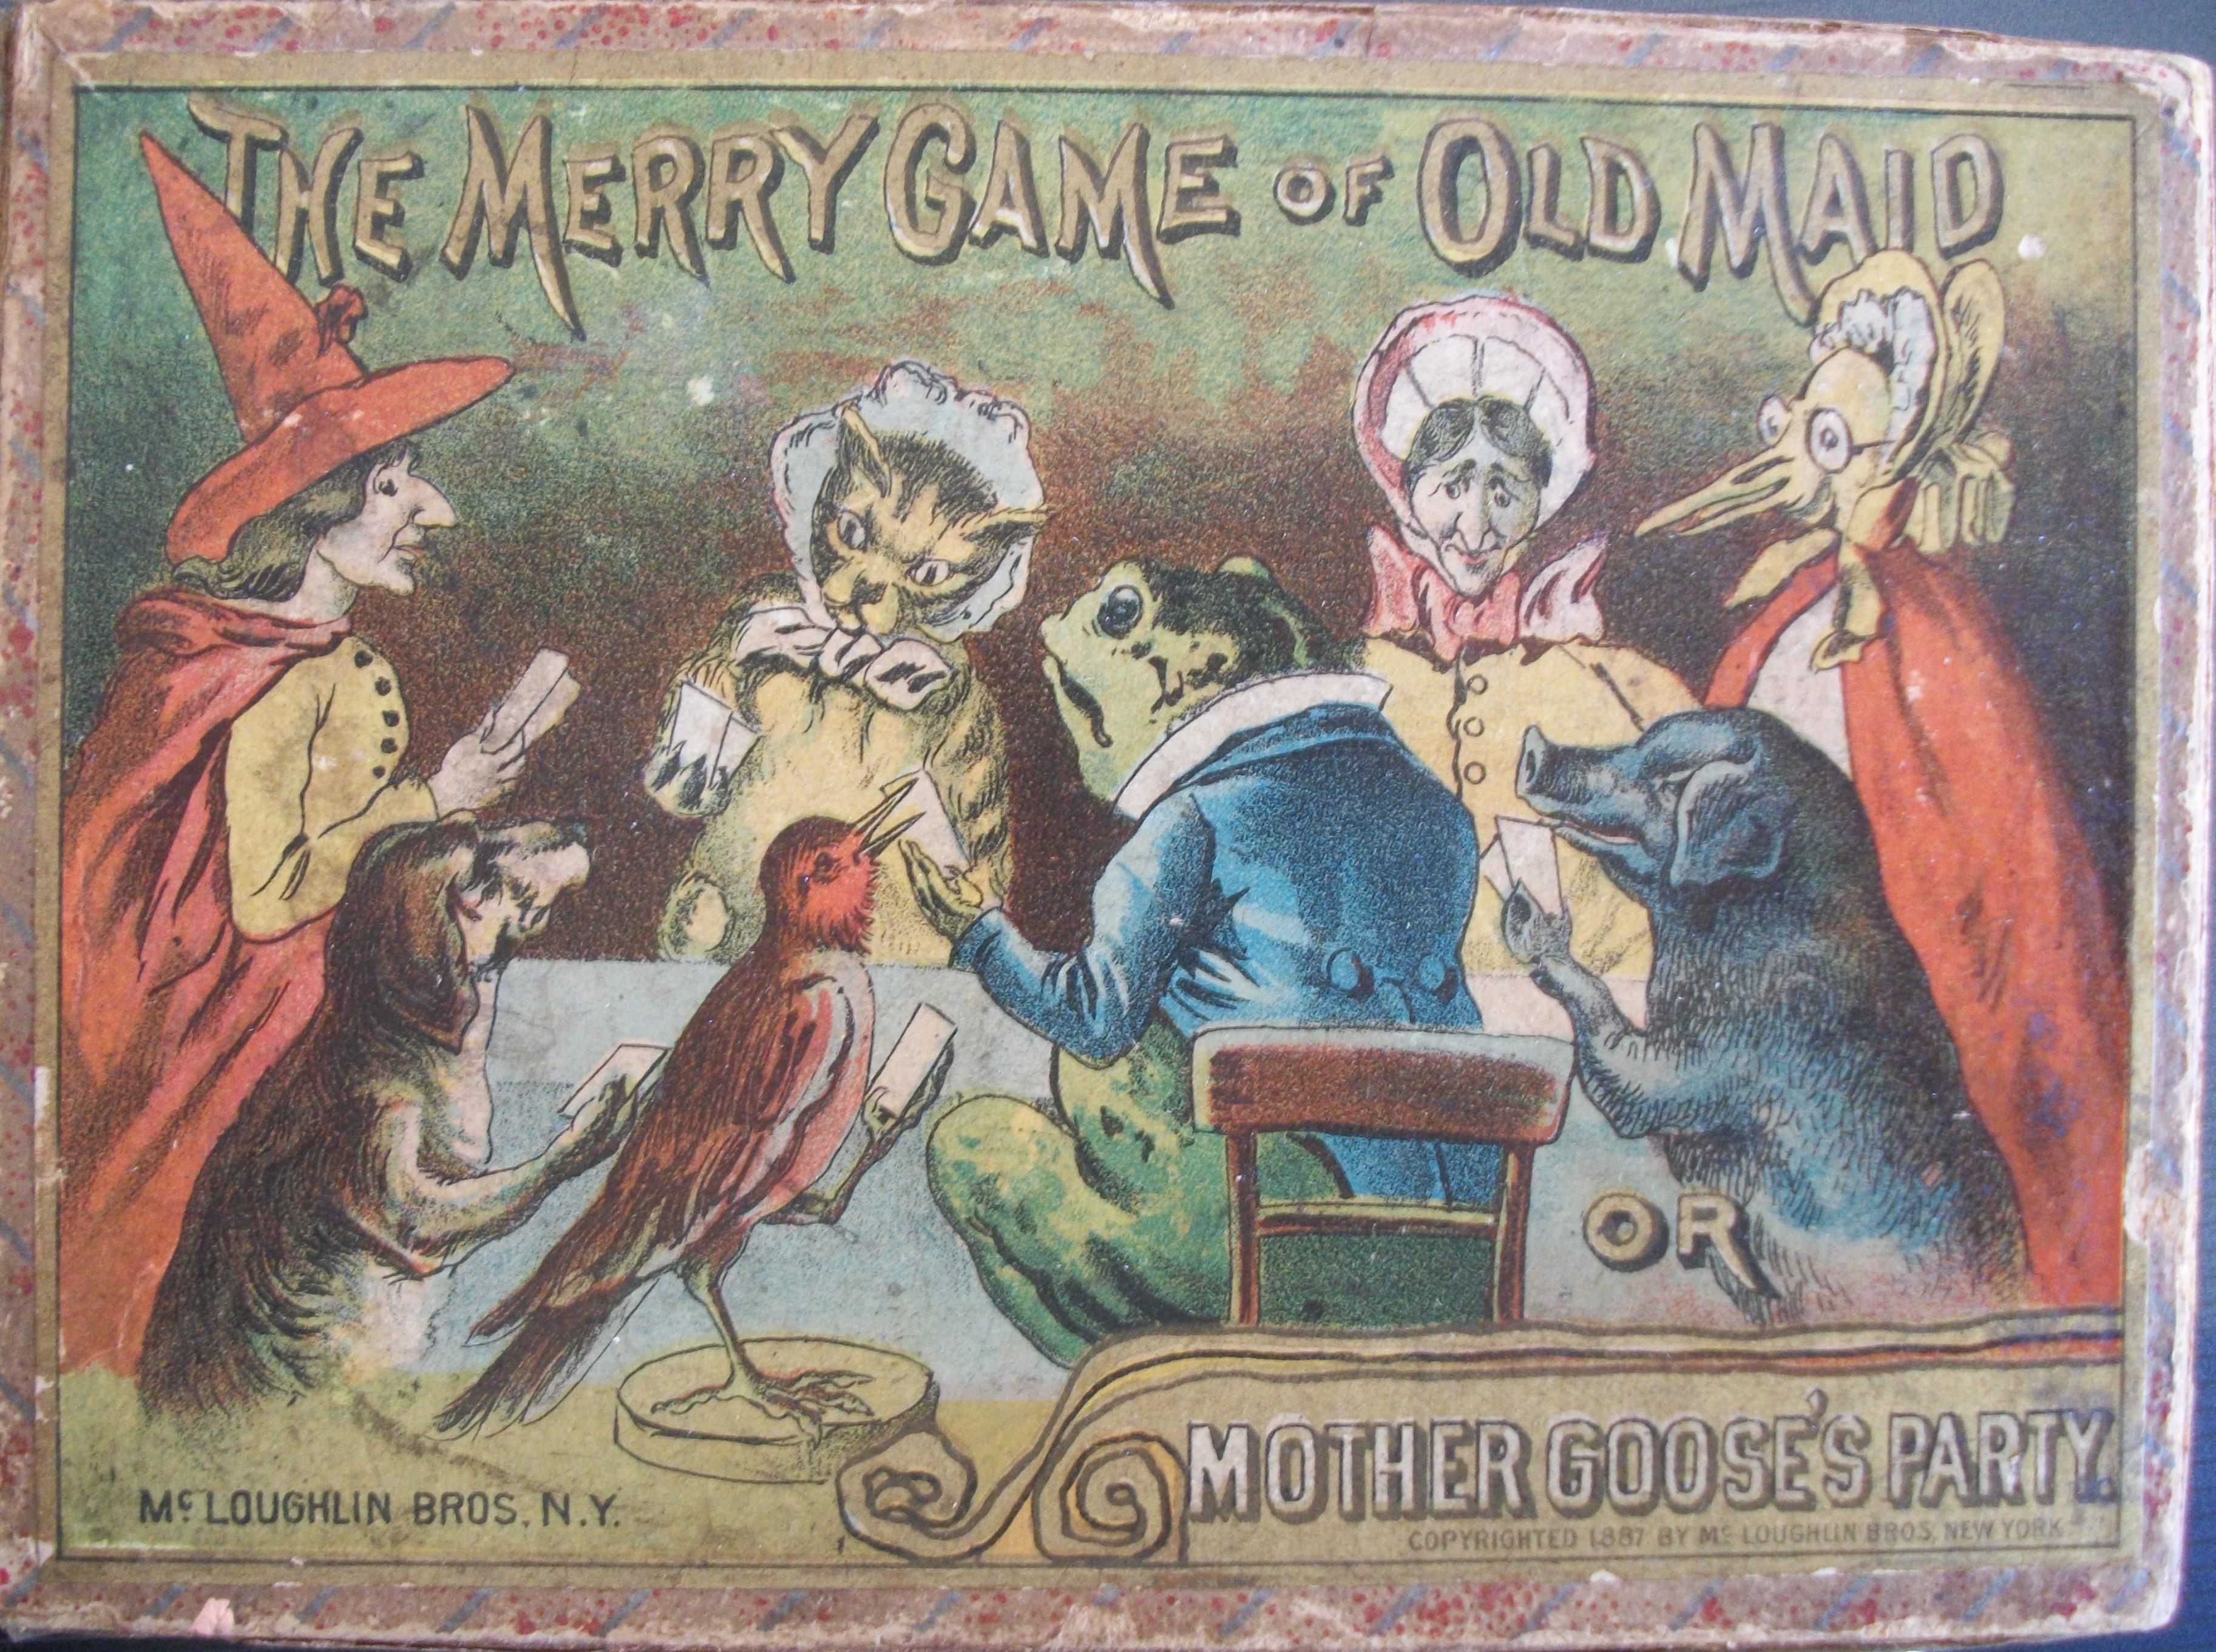 antique Mcloughlin bros 1887 old maid game